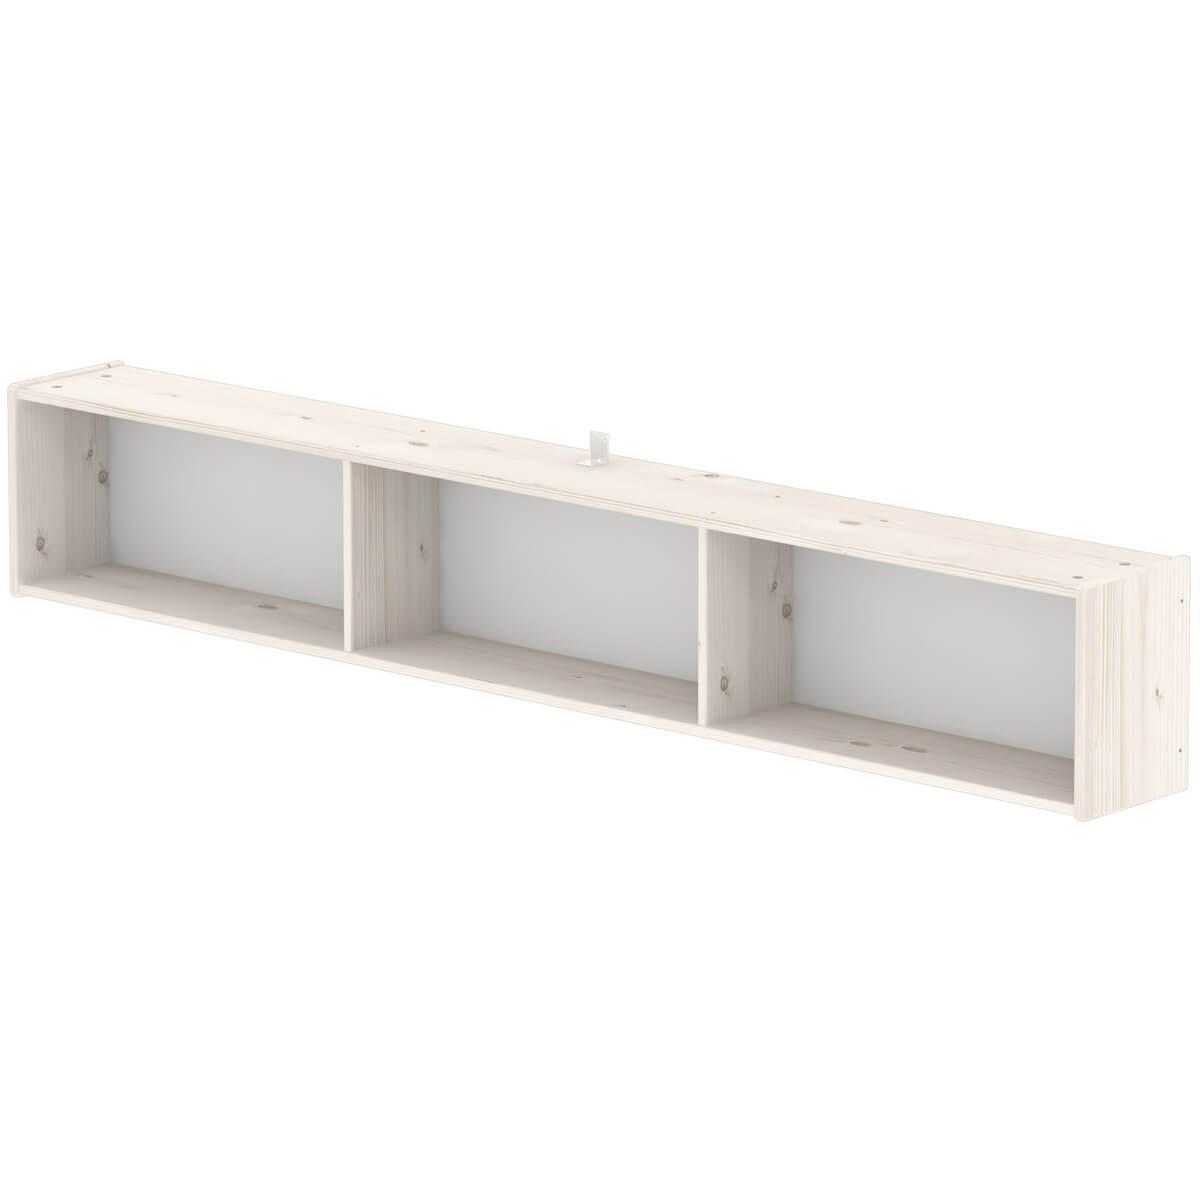 Estantería infantil de pared compartimentos 190 cm CLASSIC Flexa blanco ca